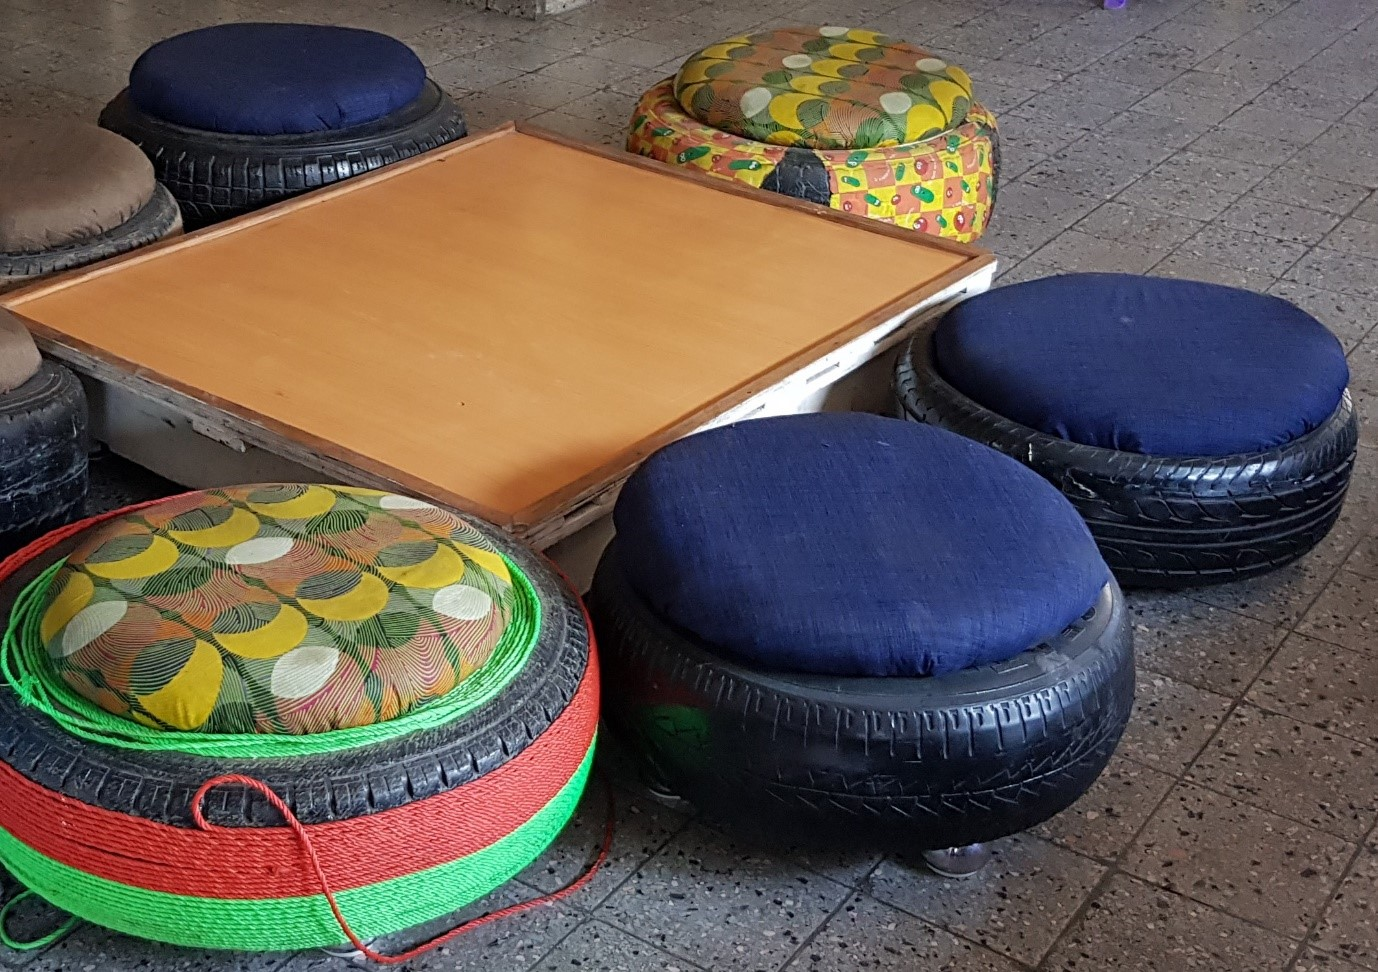 Seating area designed and made by the resident girls at Matumaini orphanage in Kinshasa, DRC, October 5, 2019 UN GLOBAL COMPACT NETWORK UK/Benafsha Delgado